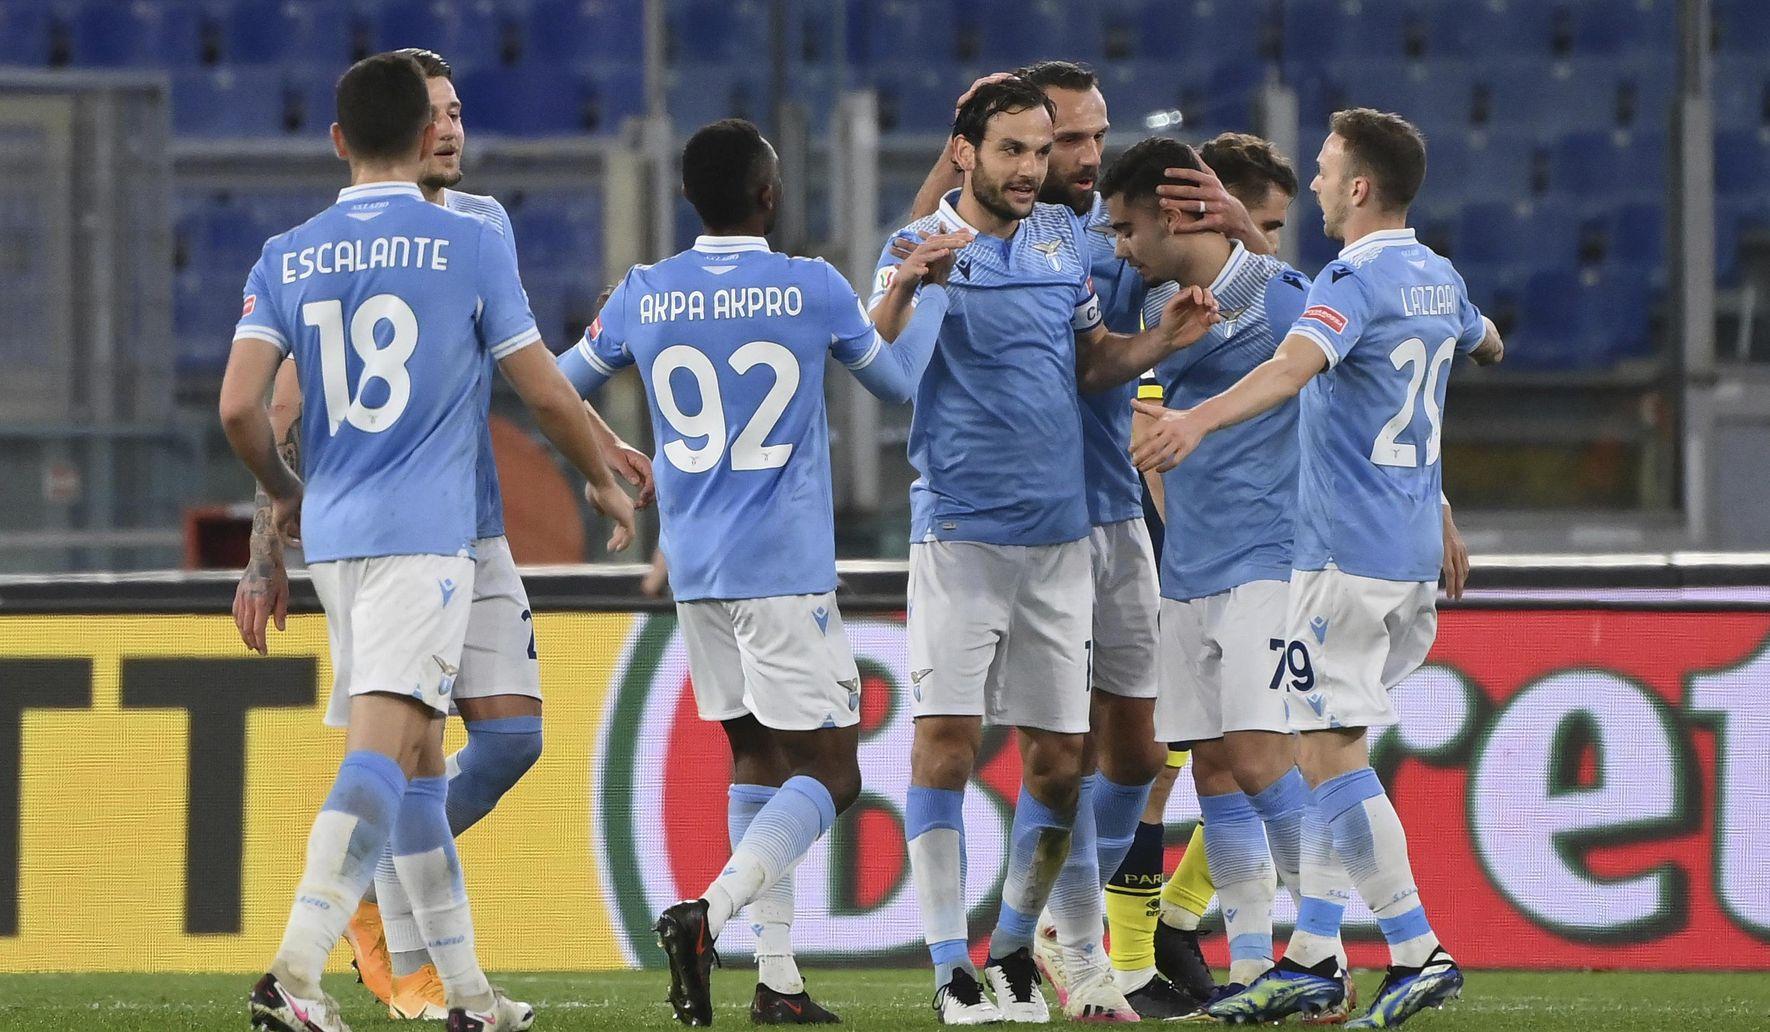 Italy_soccer_italian_cup_36541_c0-124-2968-1854_s1770x1032